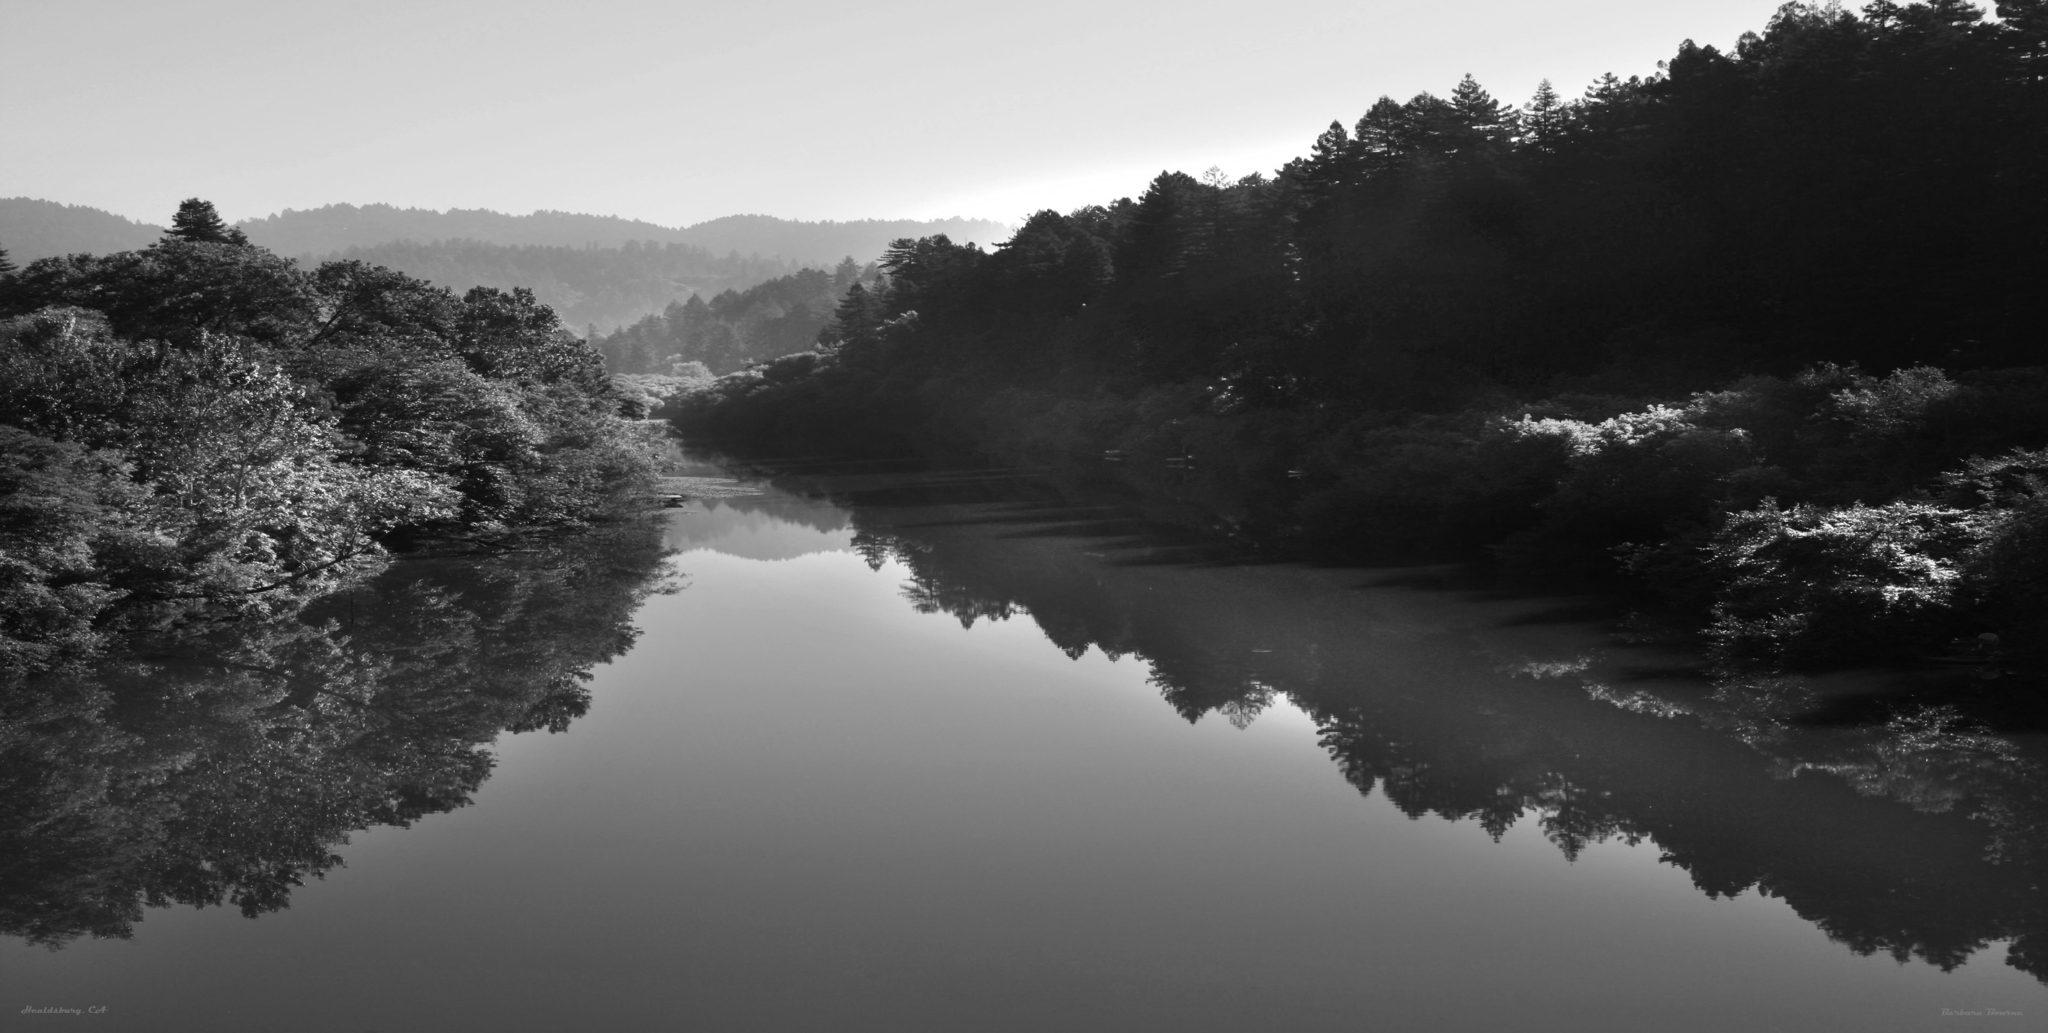 Russian River in Healdsburg, CA Black and White